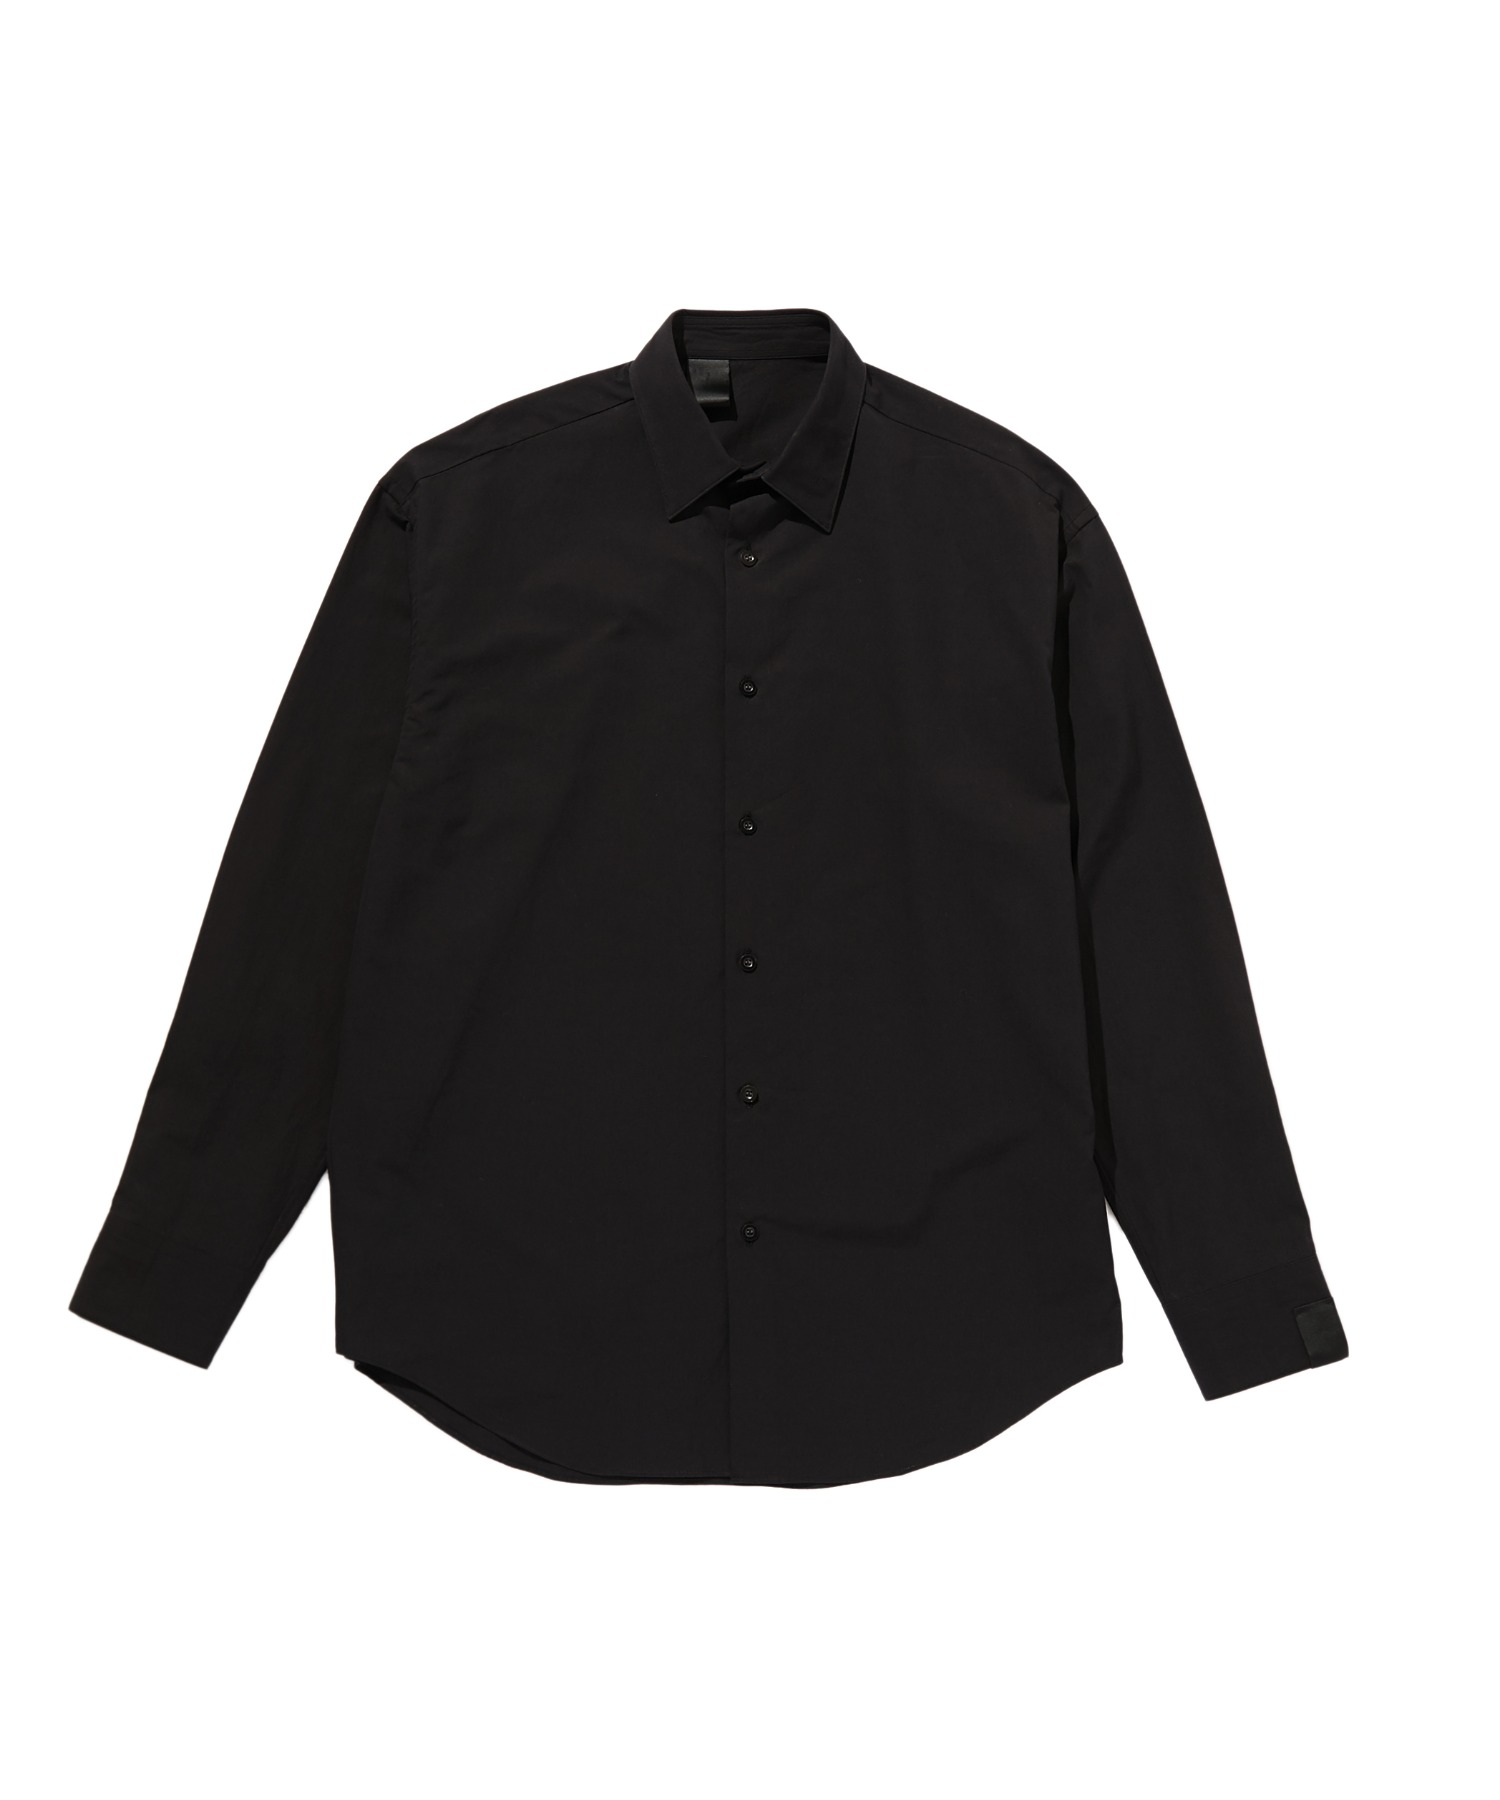 SPRING2020 DRESS SHIRT